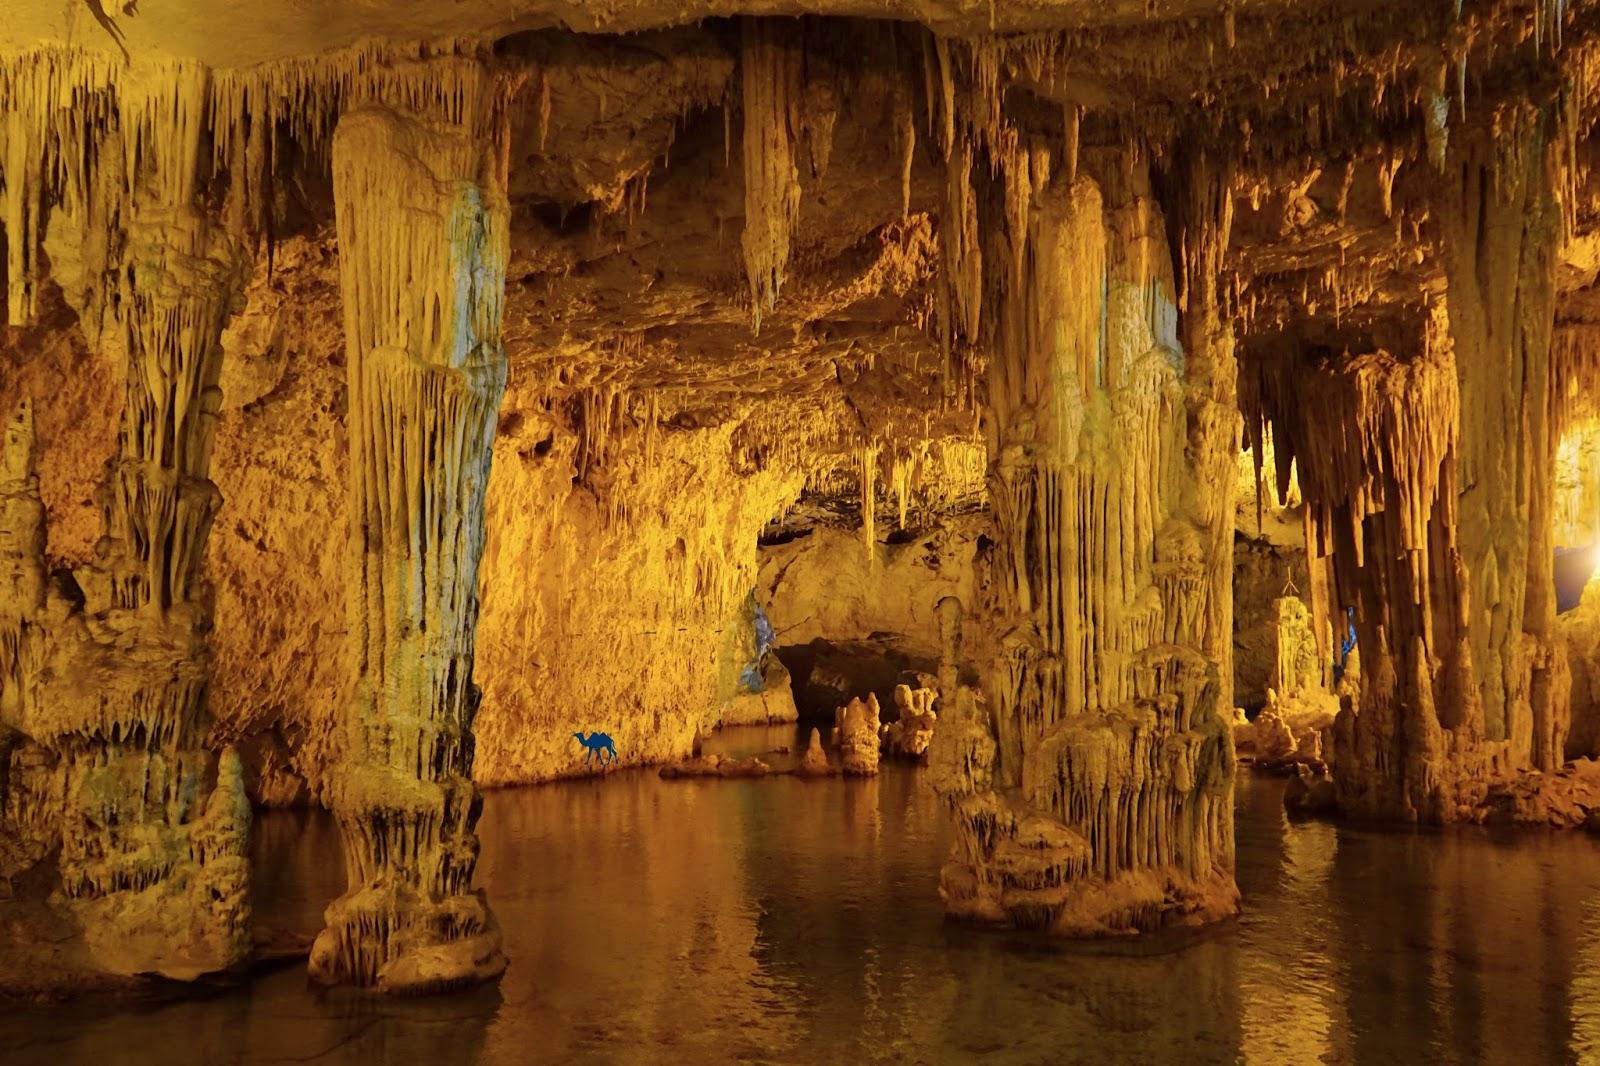 Le Chameau Bleu - Blog Voyage Sardaigne - Grotto di nettuno - Grotte de Neptune en Sardaigne Alghero